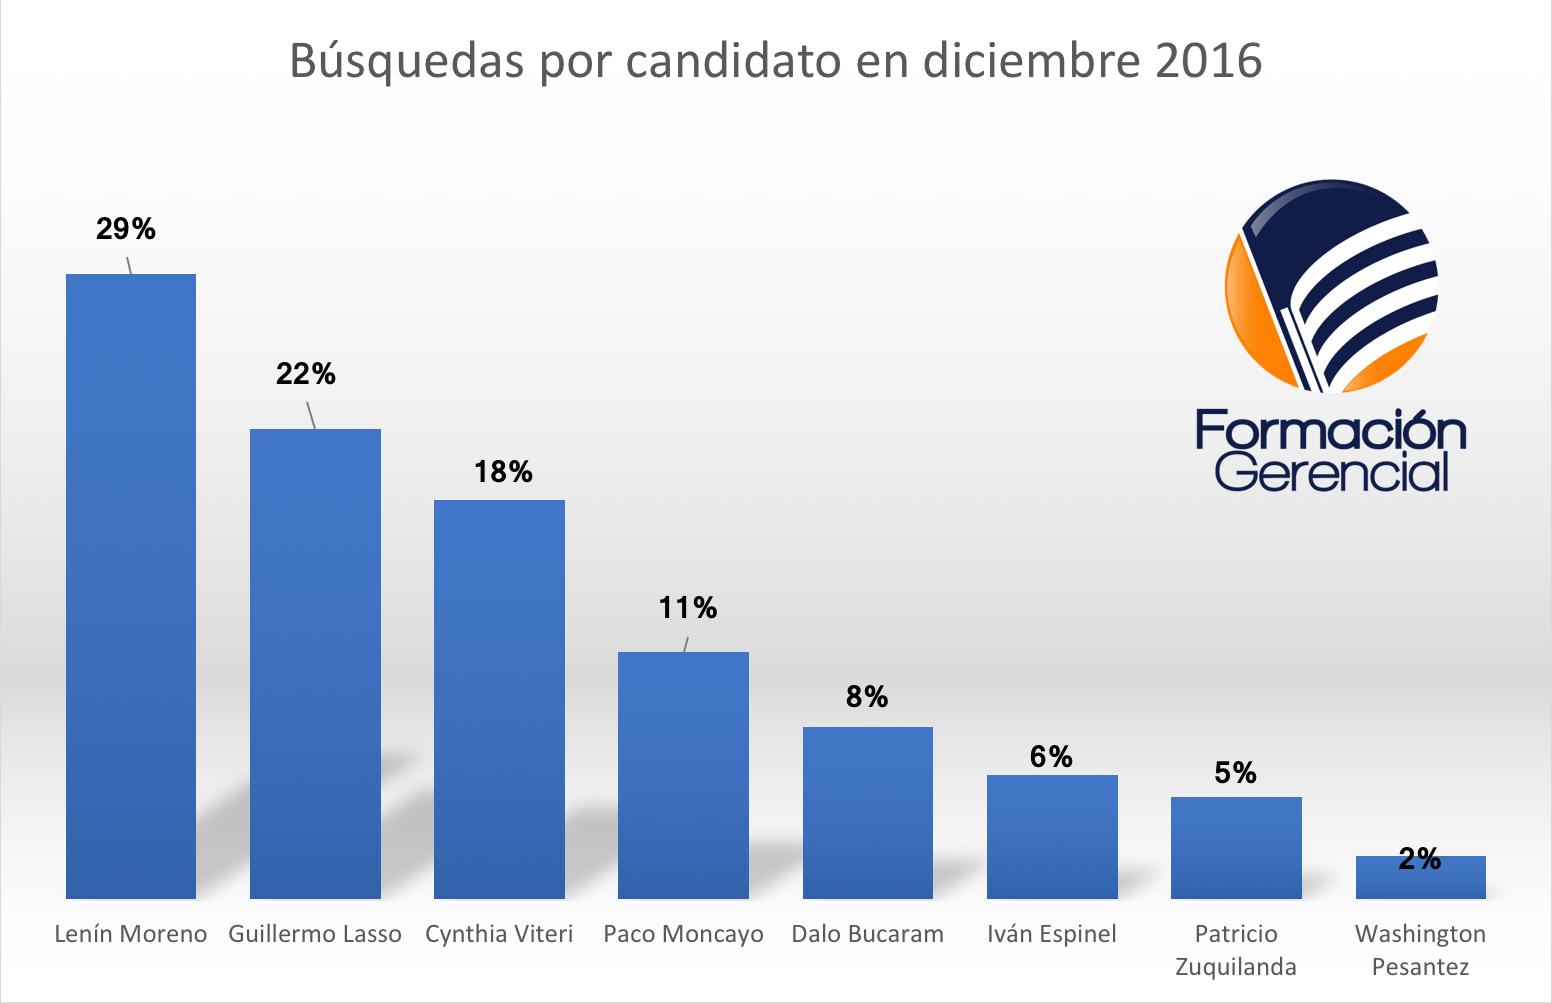 Búsquedas Candidatos Presidenciales Ecuador 2017 diciembre 2016